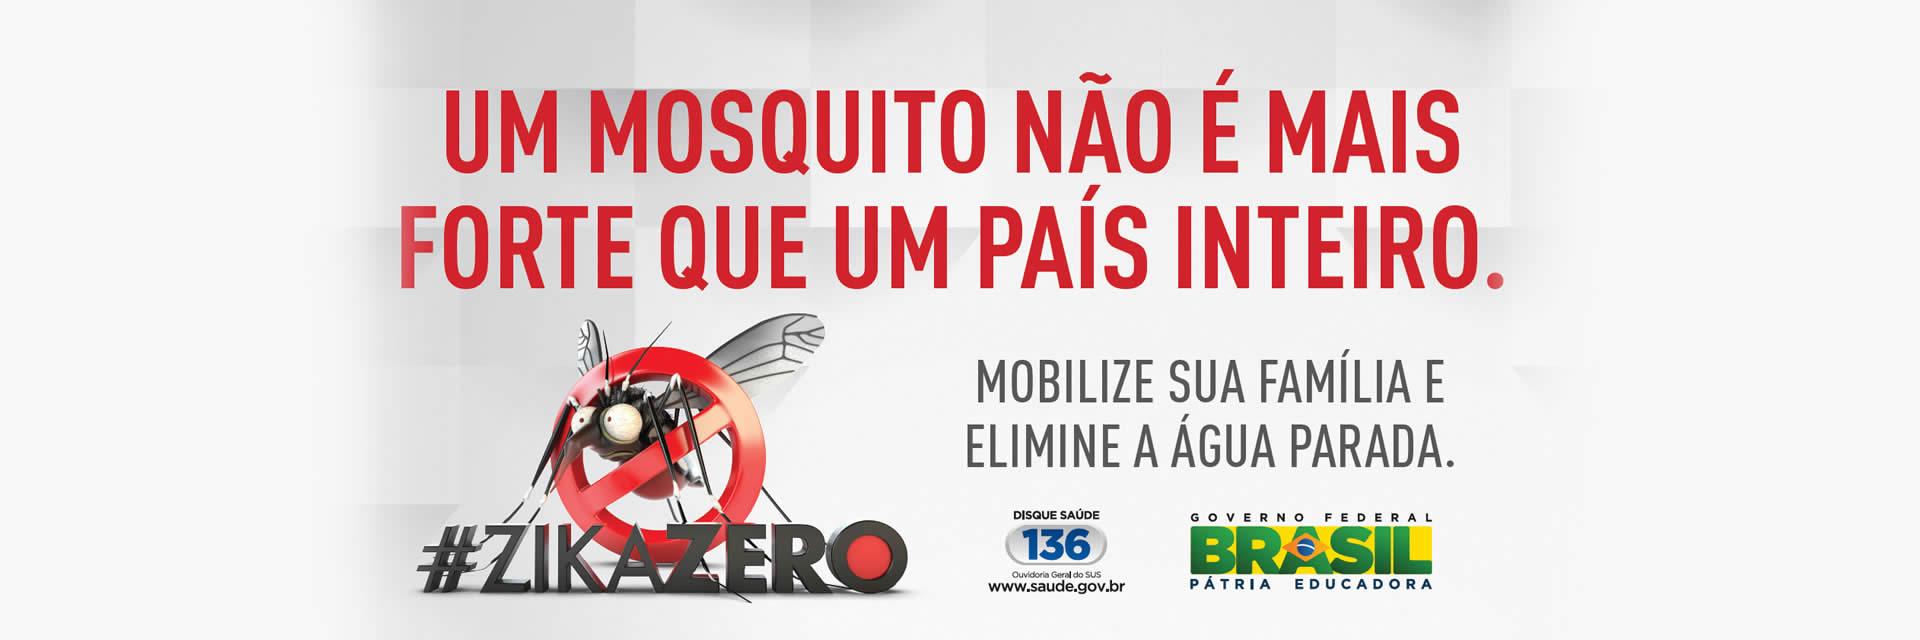 Campanha mosquito zika